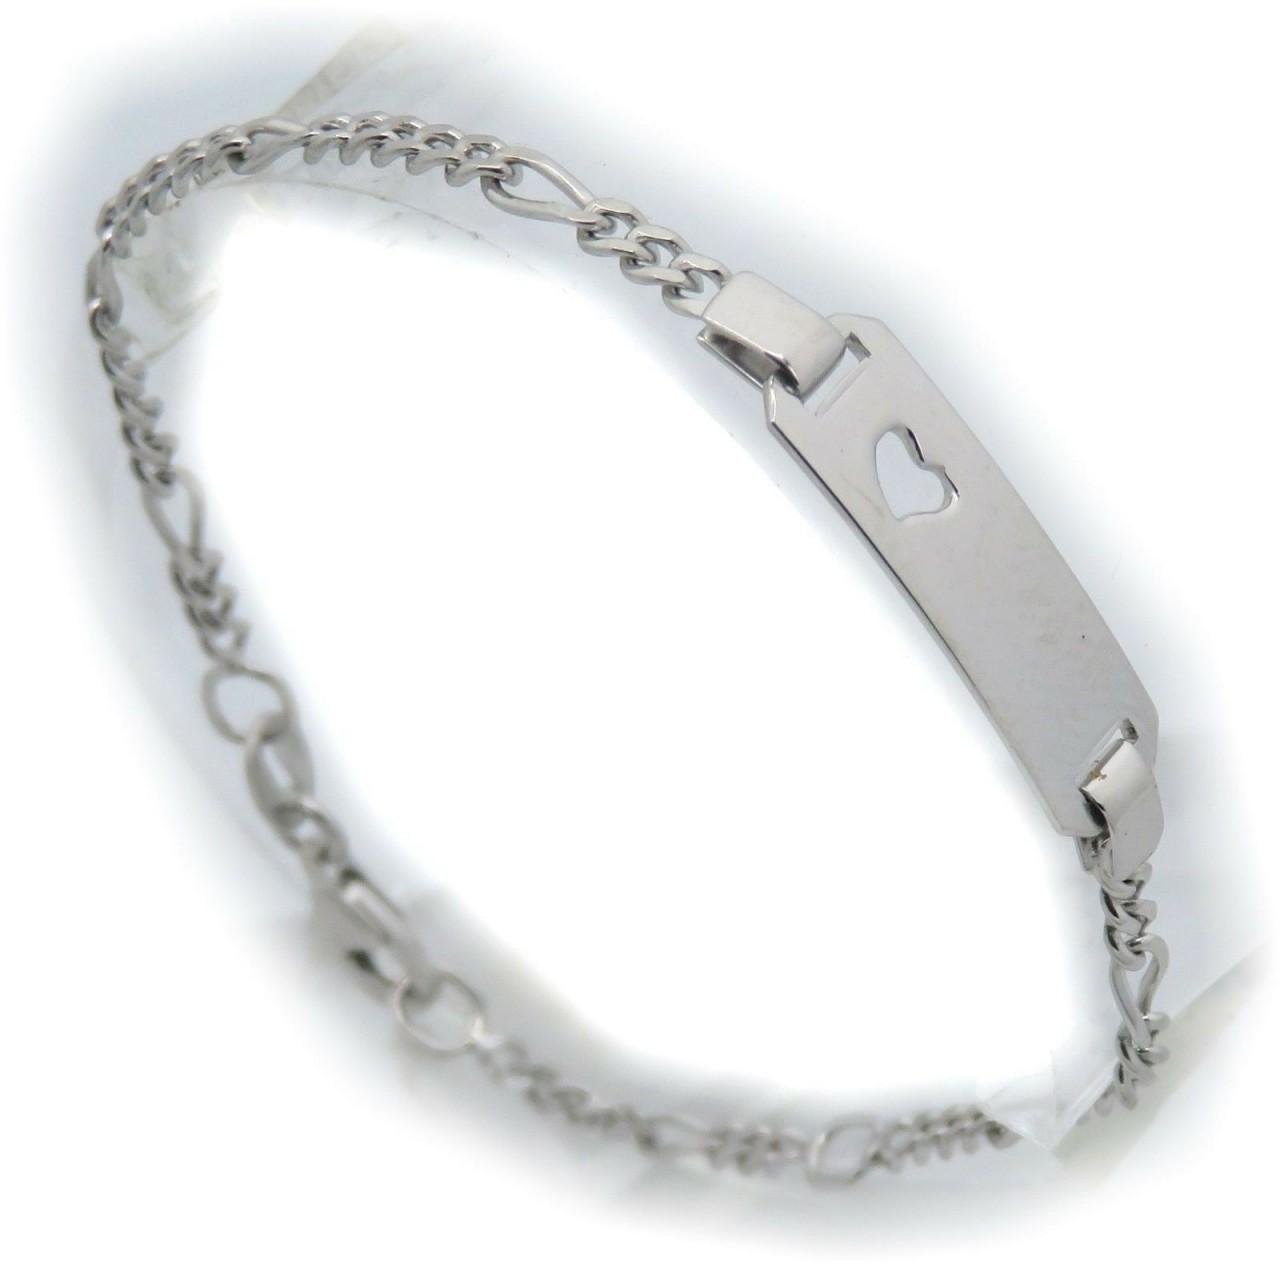 Kinderarmband Figarokette Herz 12-14 cm incl. Gravur echt Silber 925 Armband Neu